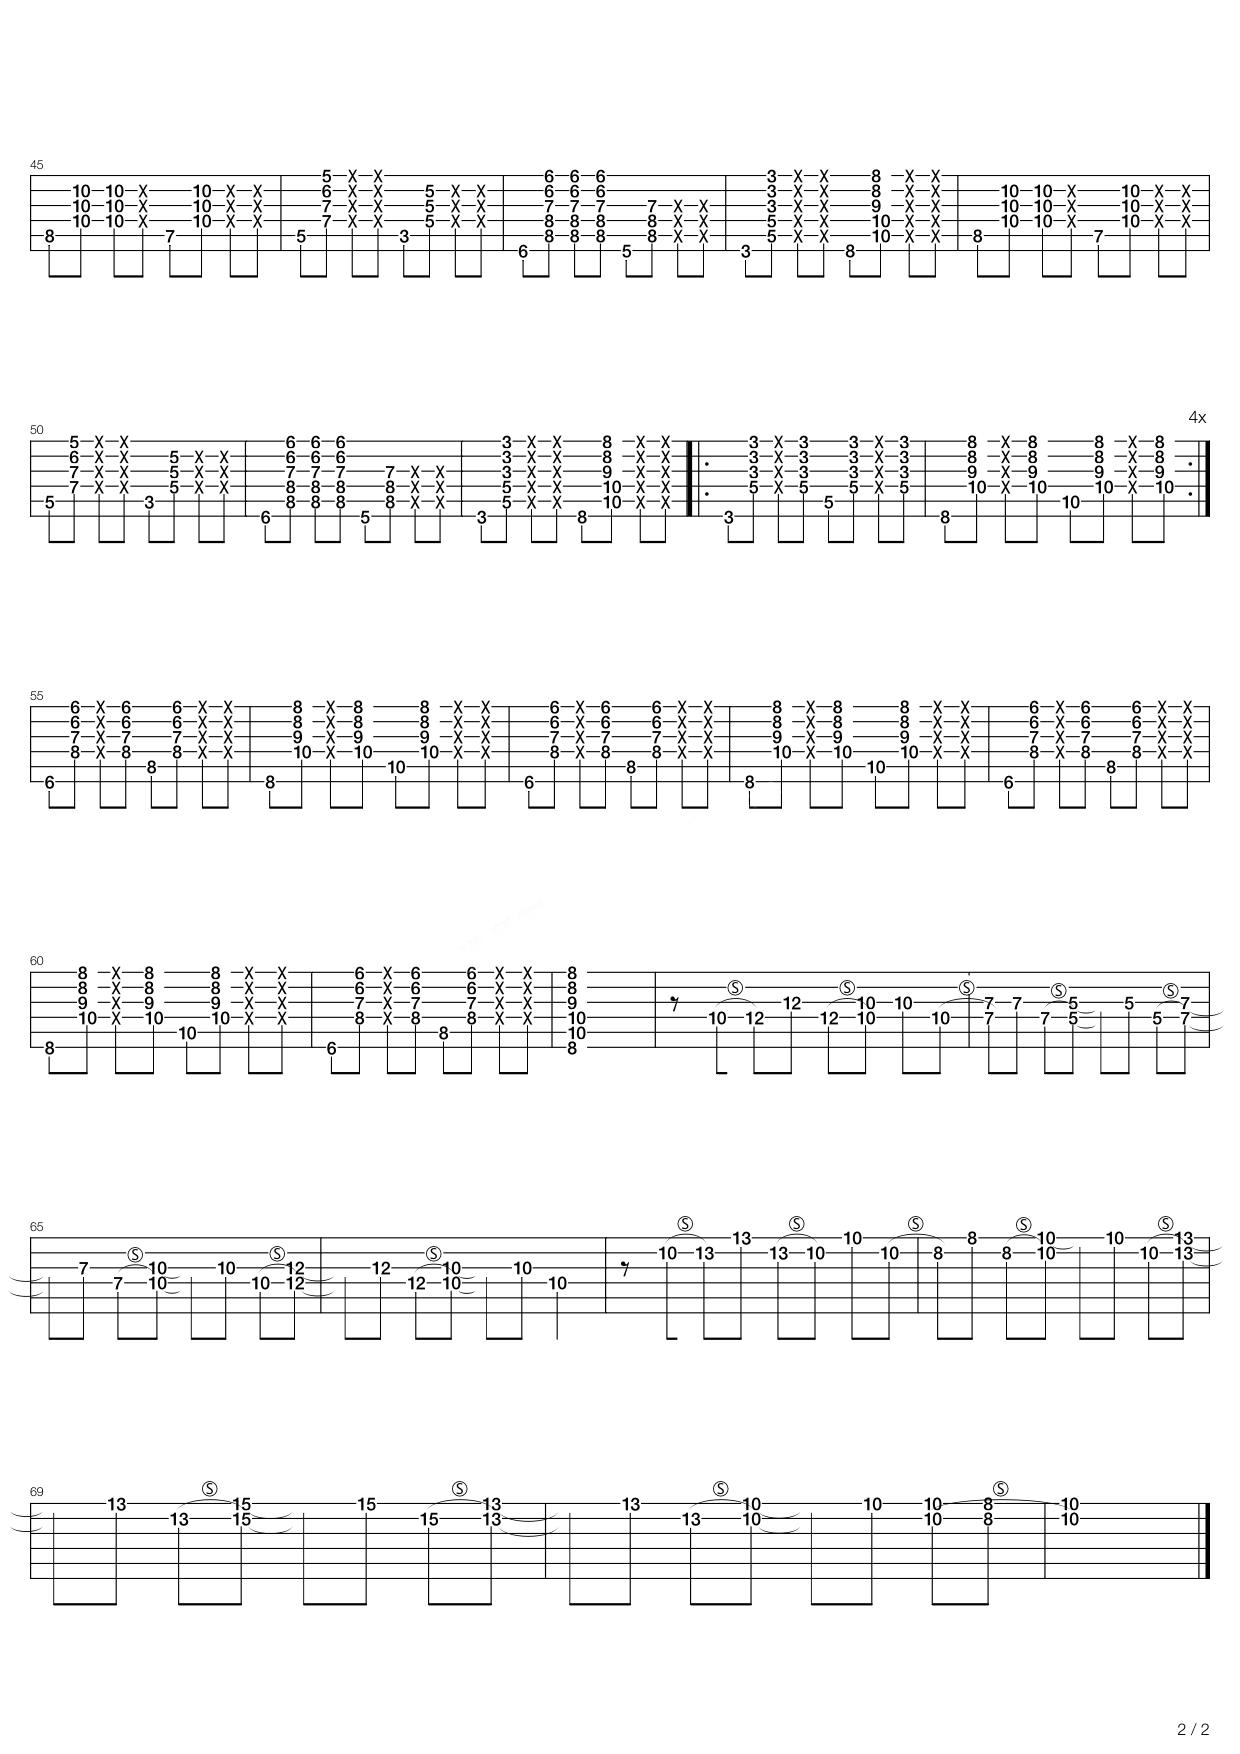 jack johnson吉他谱_Better Together吉他谱 Jack Johnson-彼岸吉他 - 一站式吉他爱好者服务平台